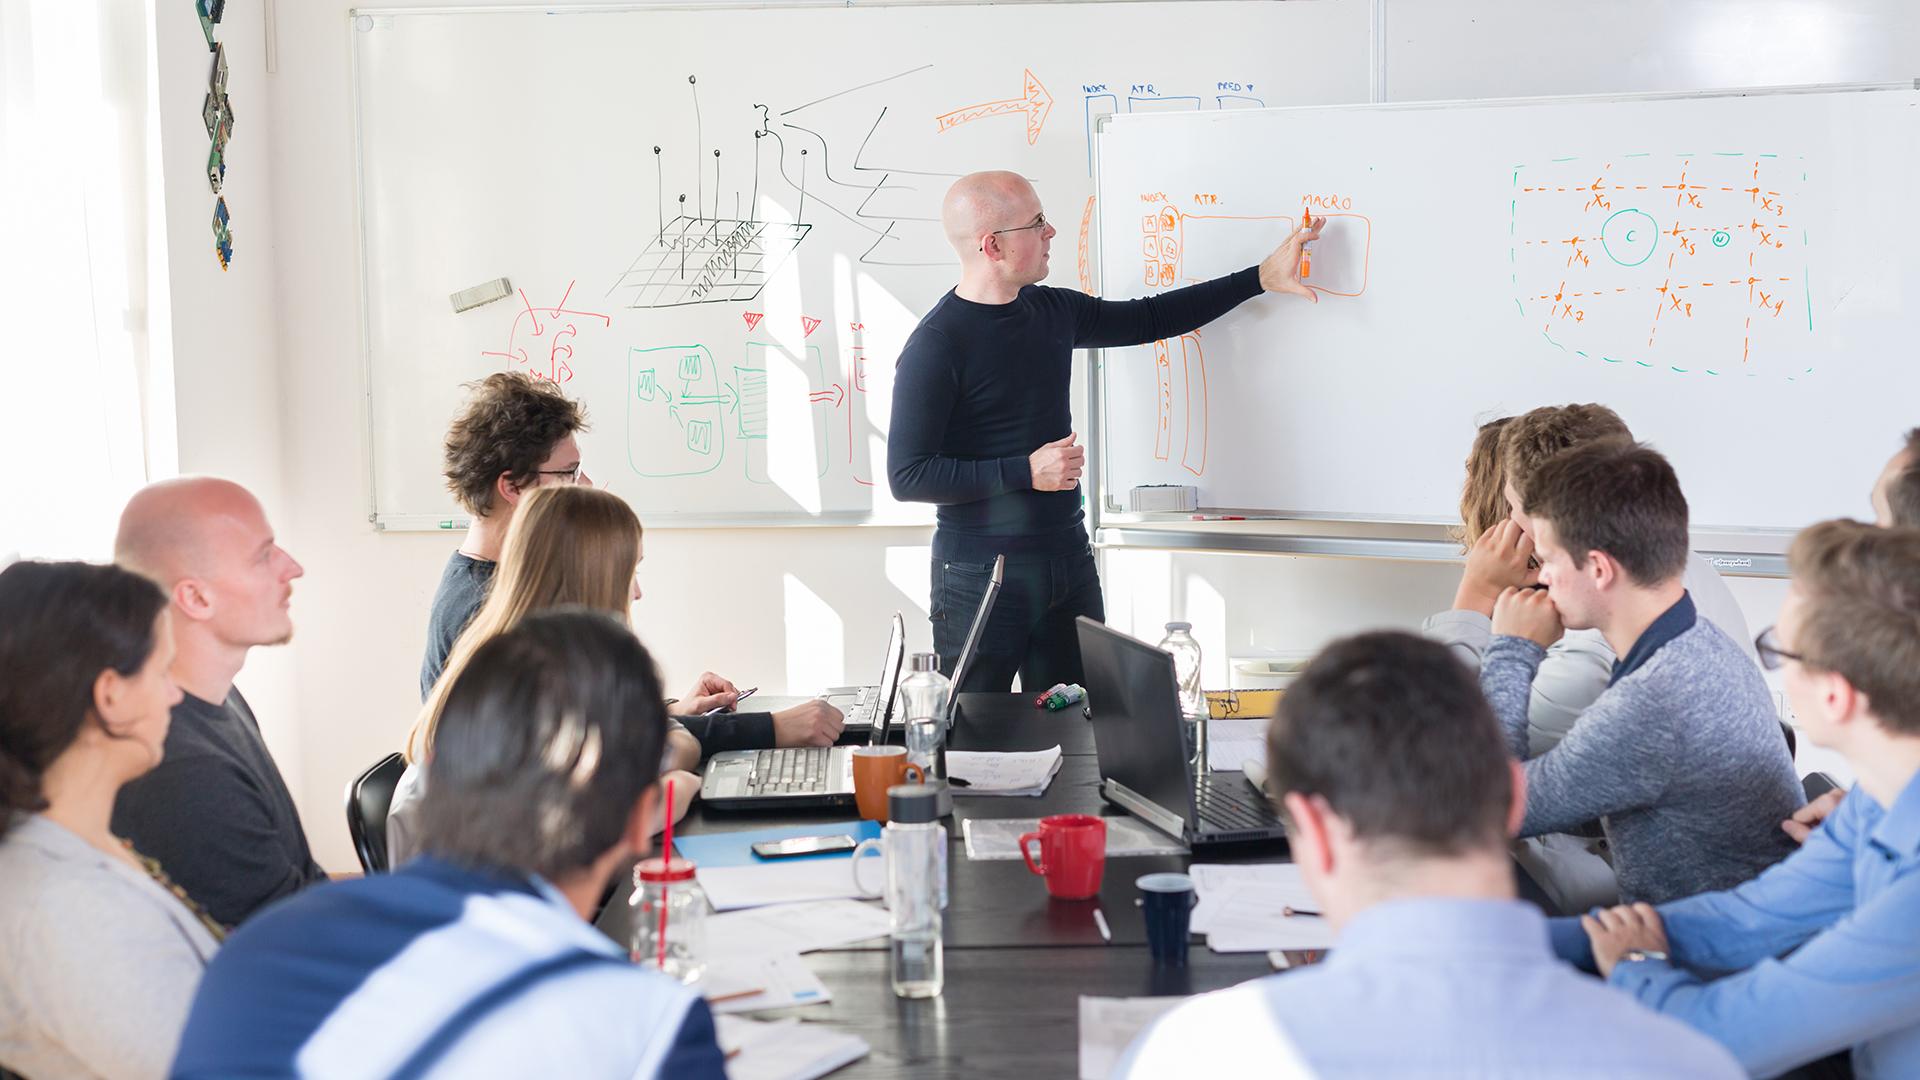 team-group-meet-whiteboard-plan-teach-strategy